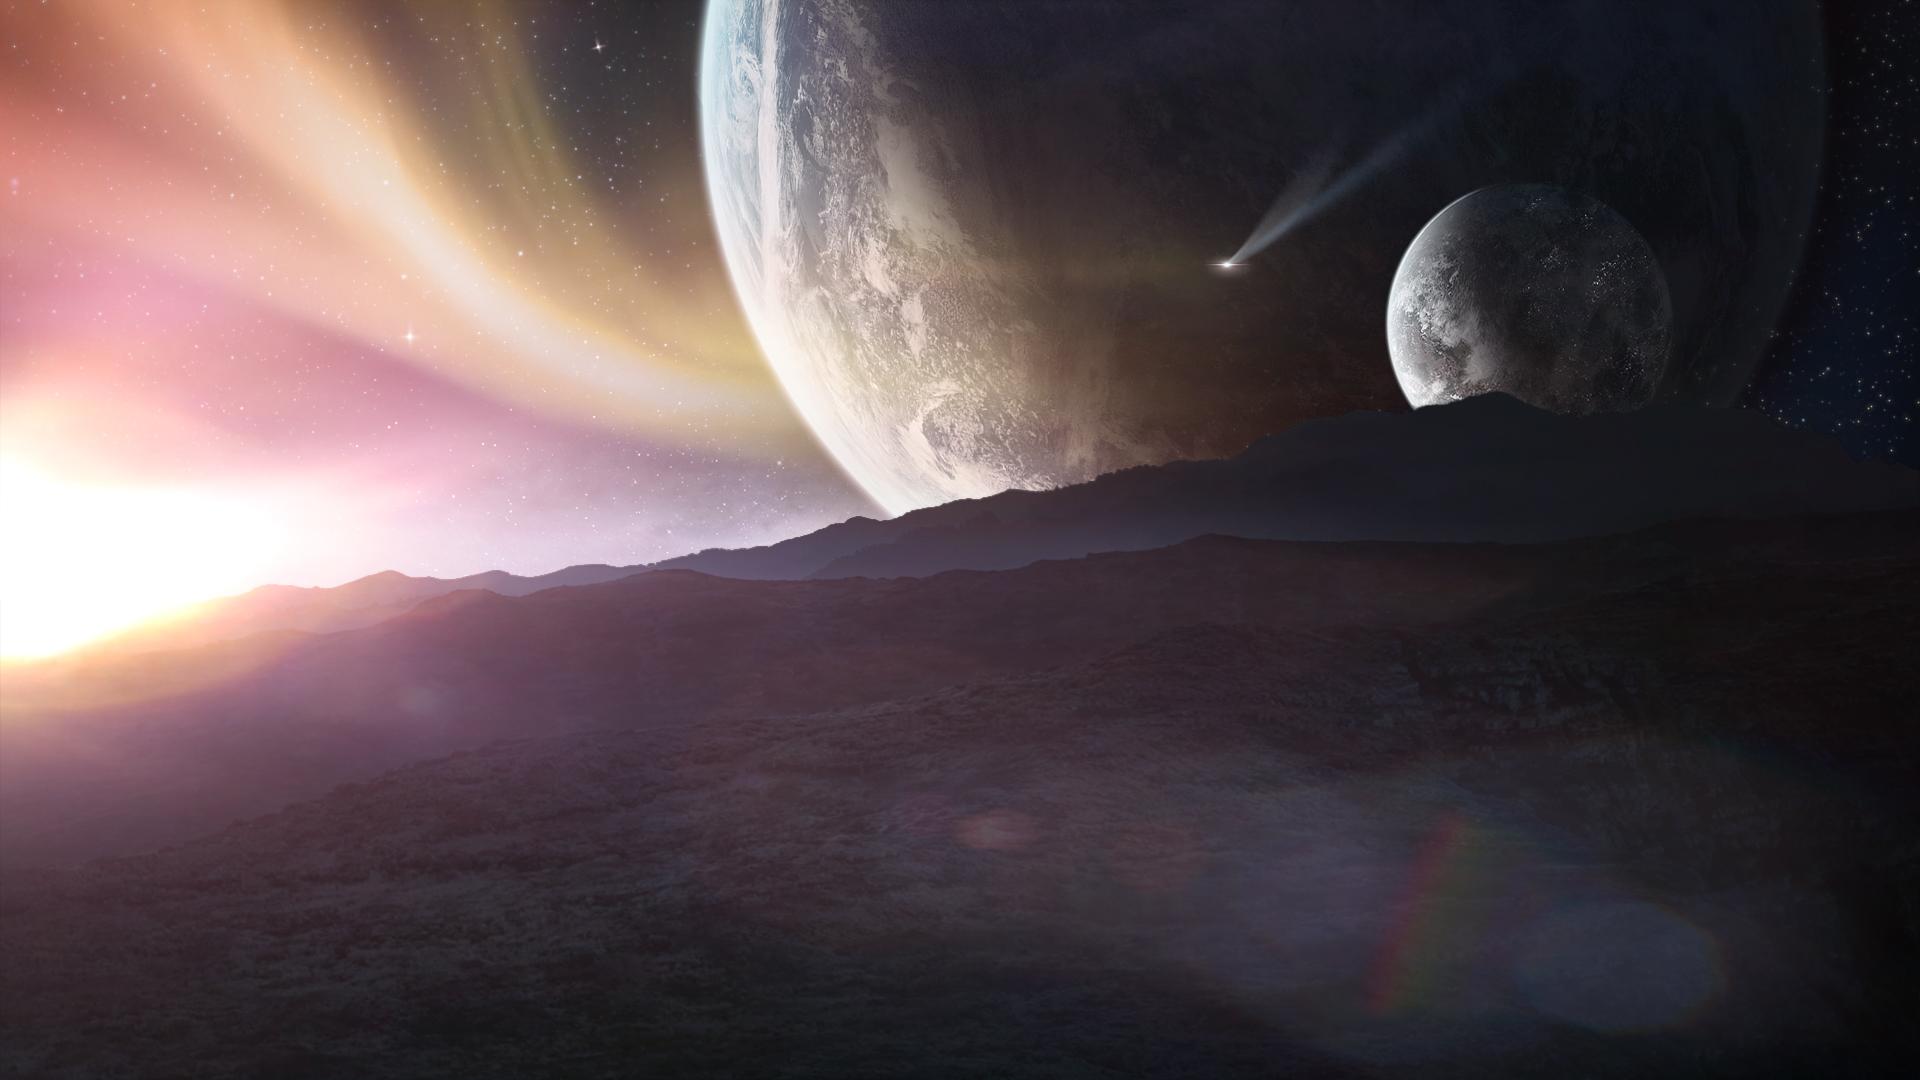 alien sunset wallpaper - photo #18